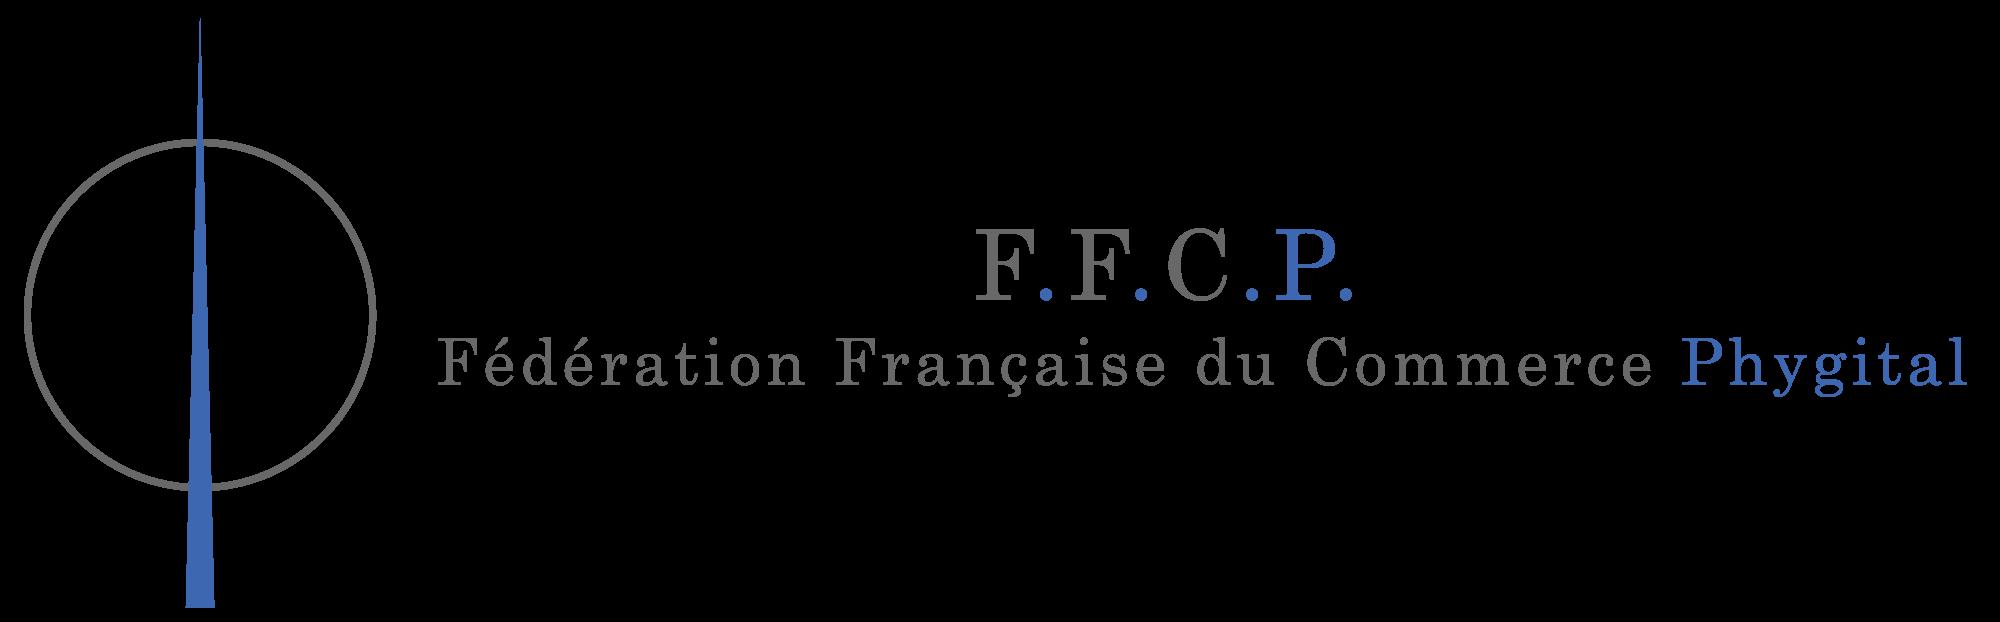 Féderation Française du Commerce Phygital